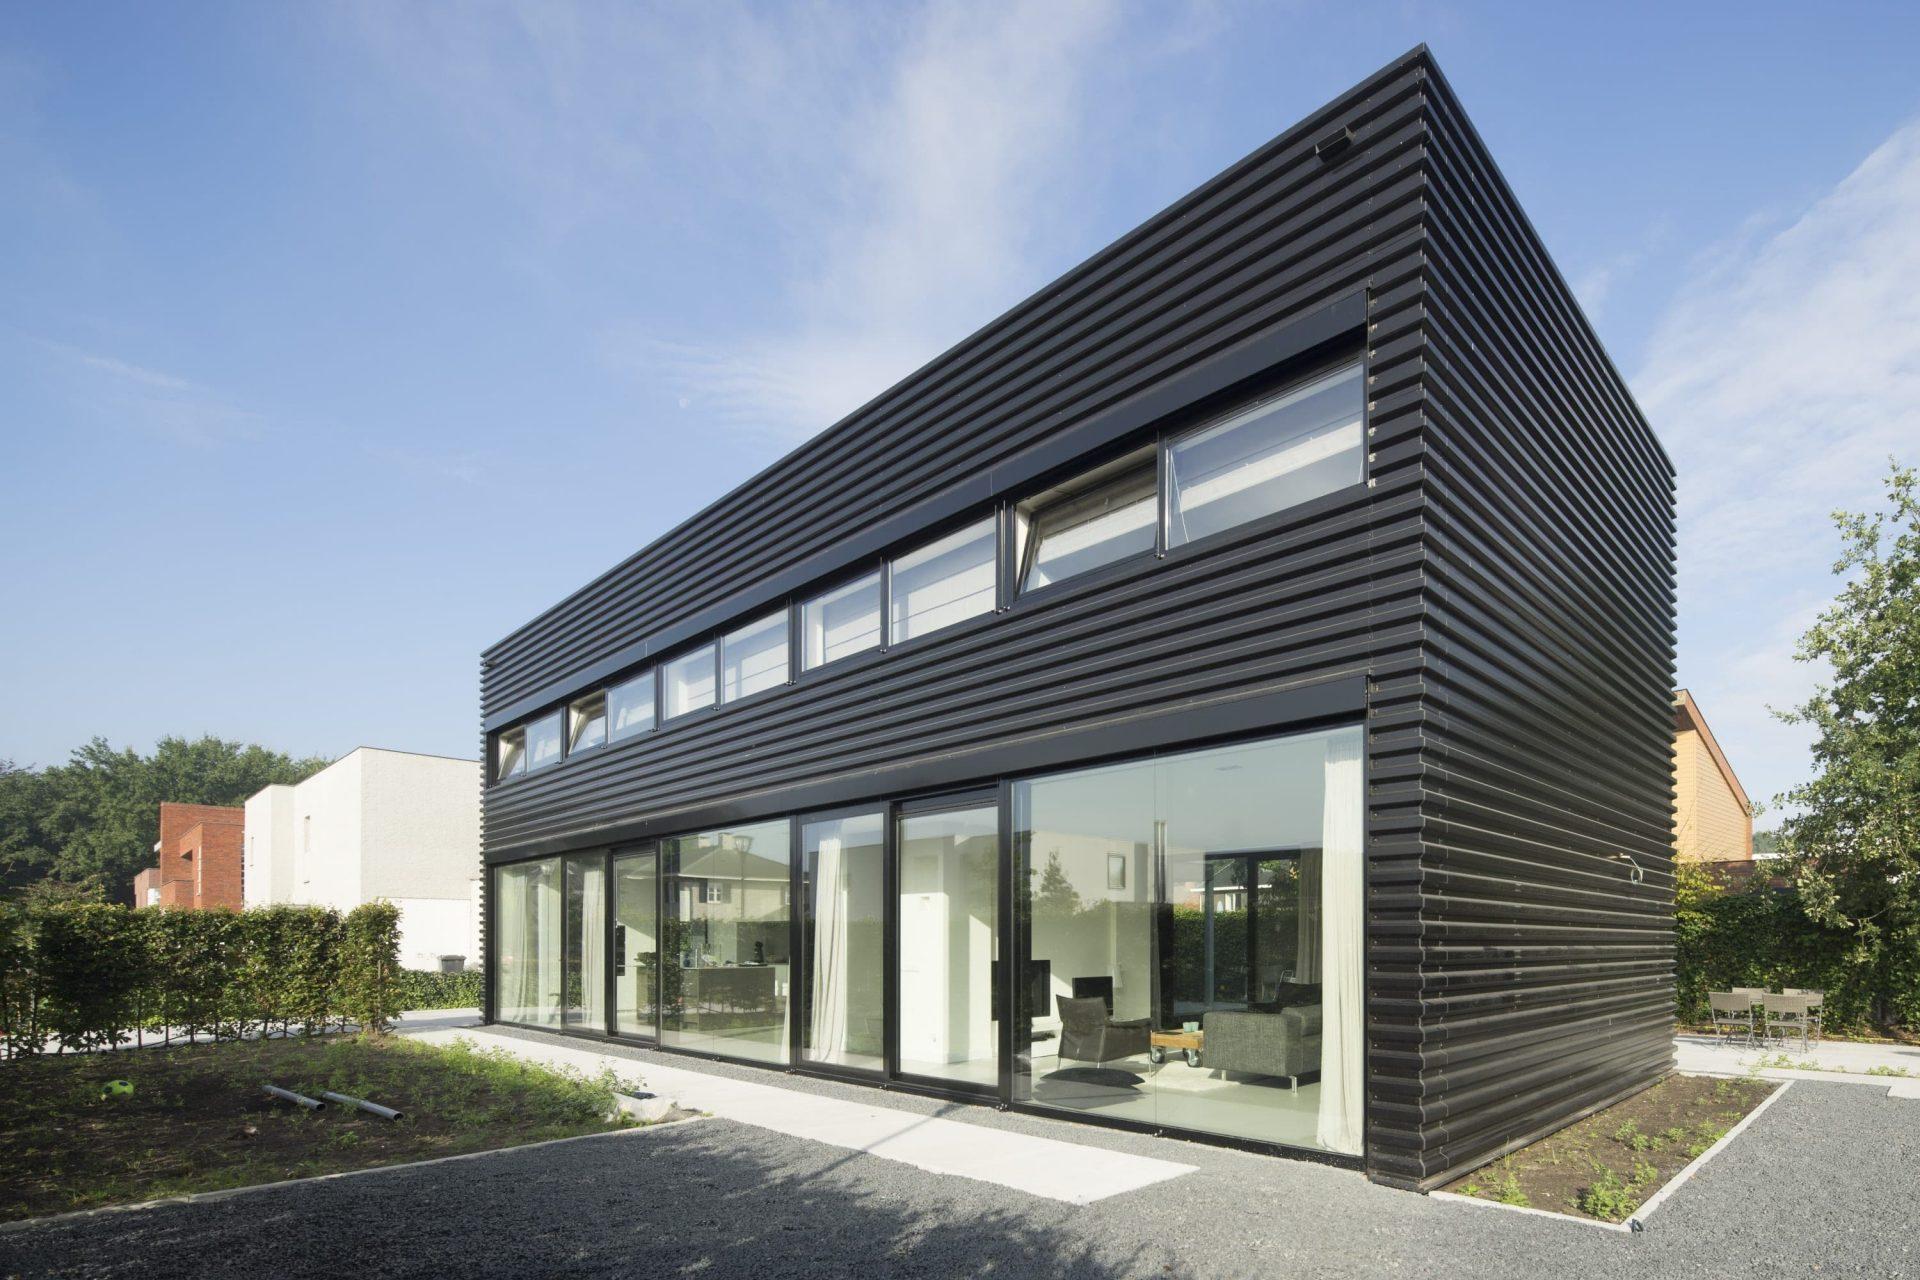 Jmw architecten modern en realistisch for Architecten moderne stijl